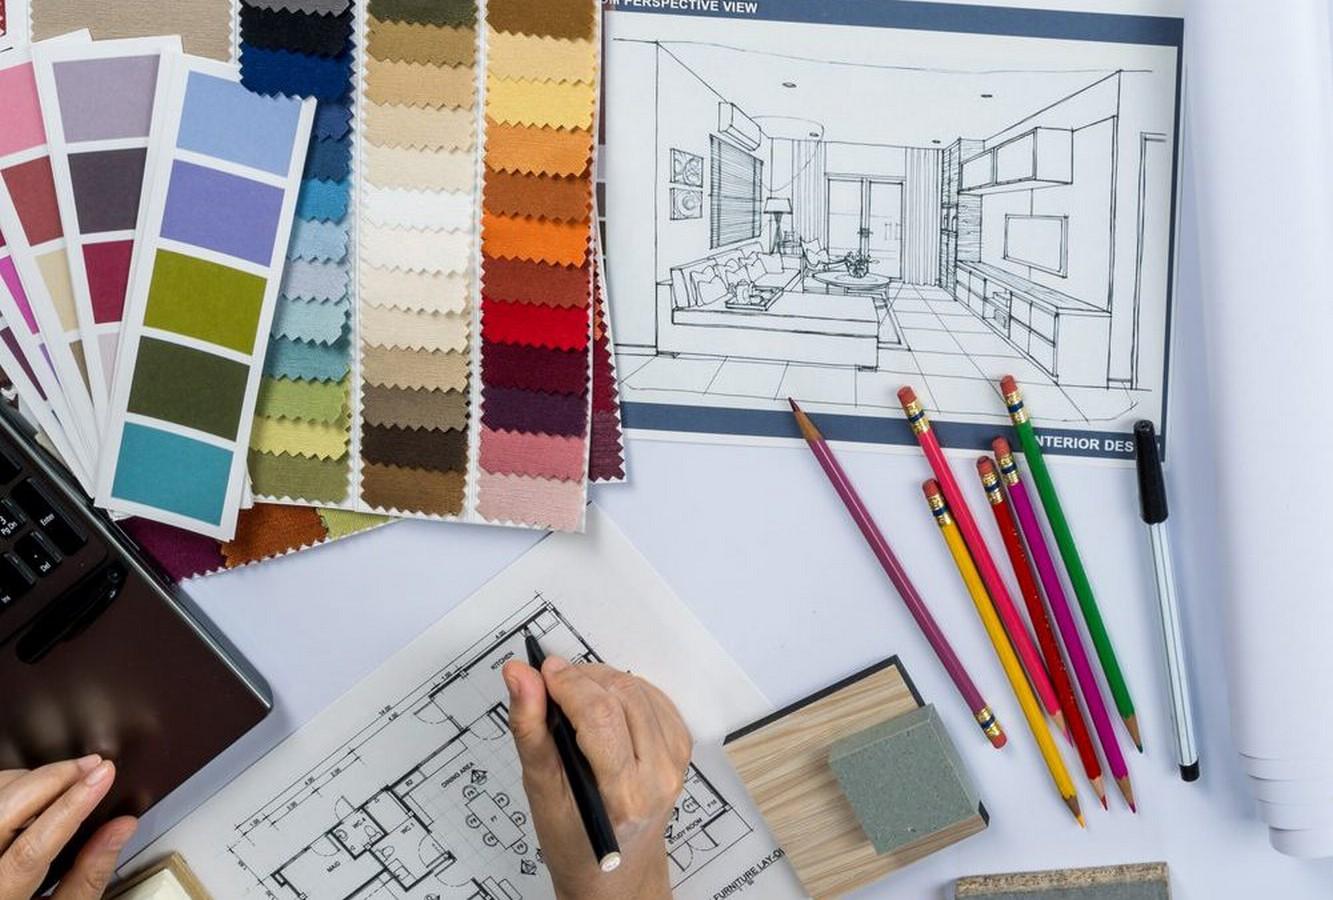 Career Guide: Interior design - Sheet1